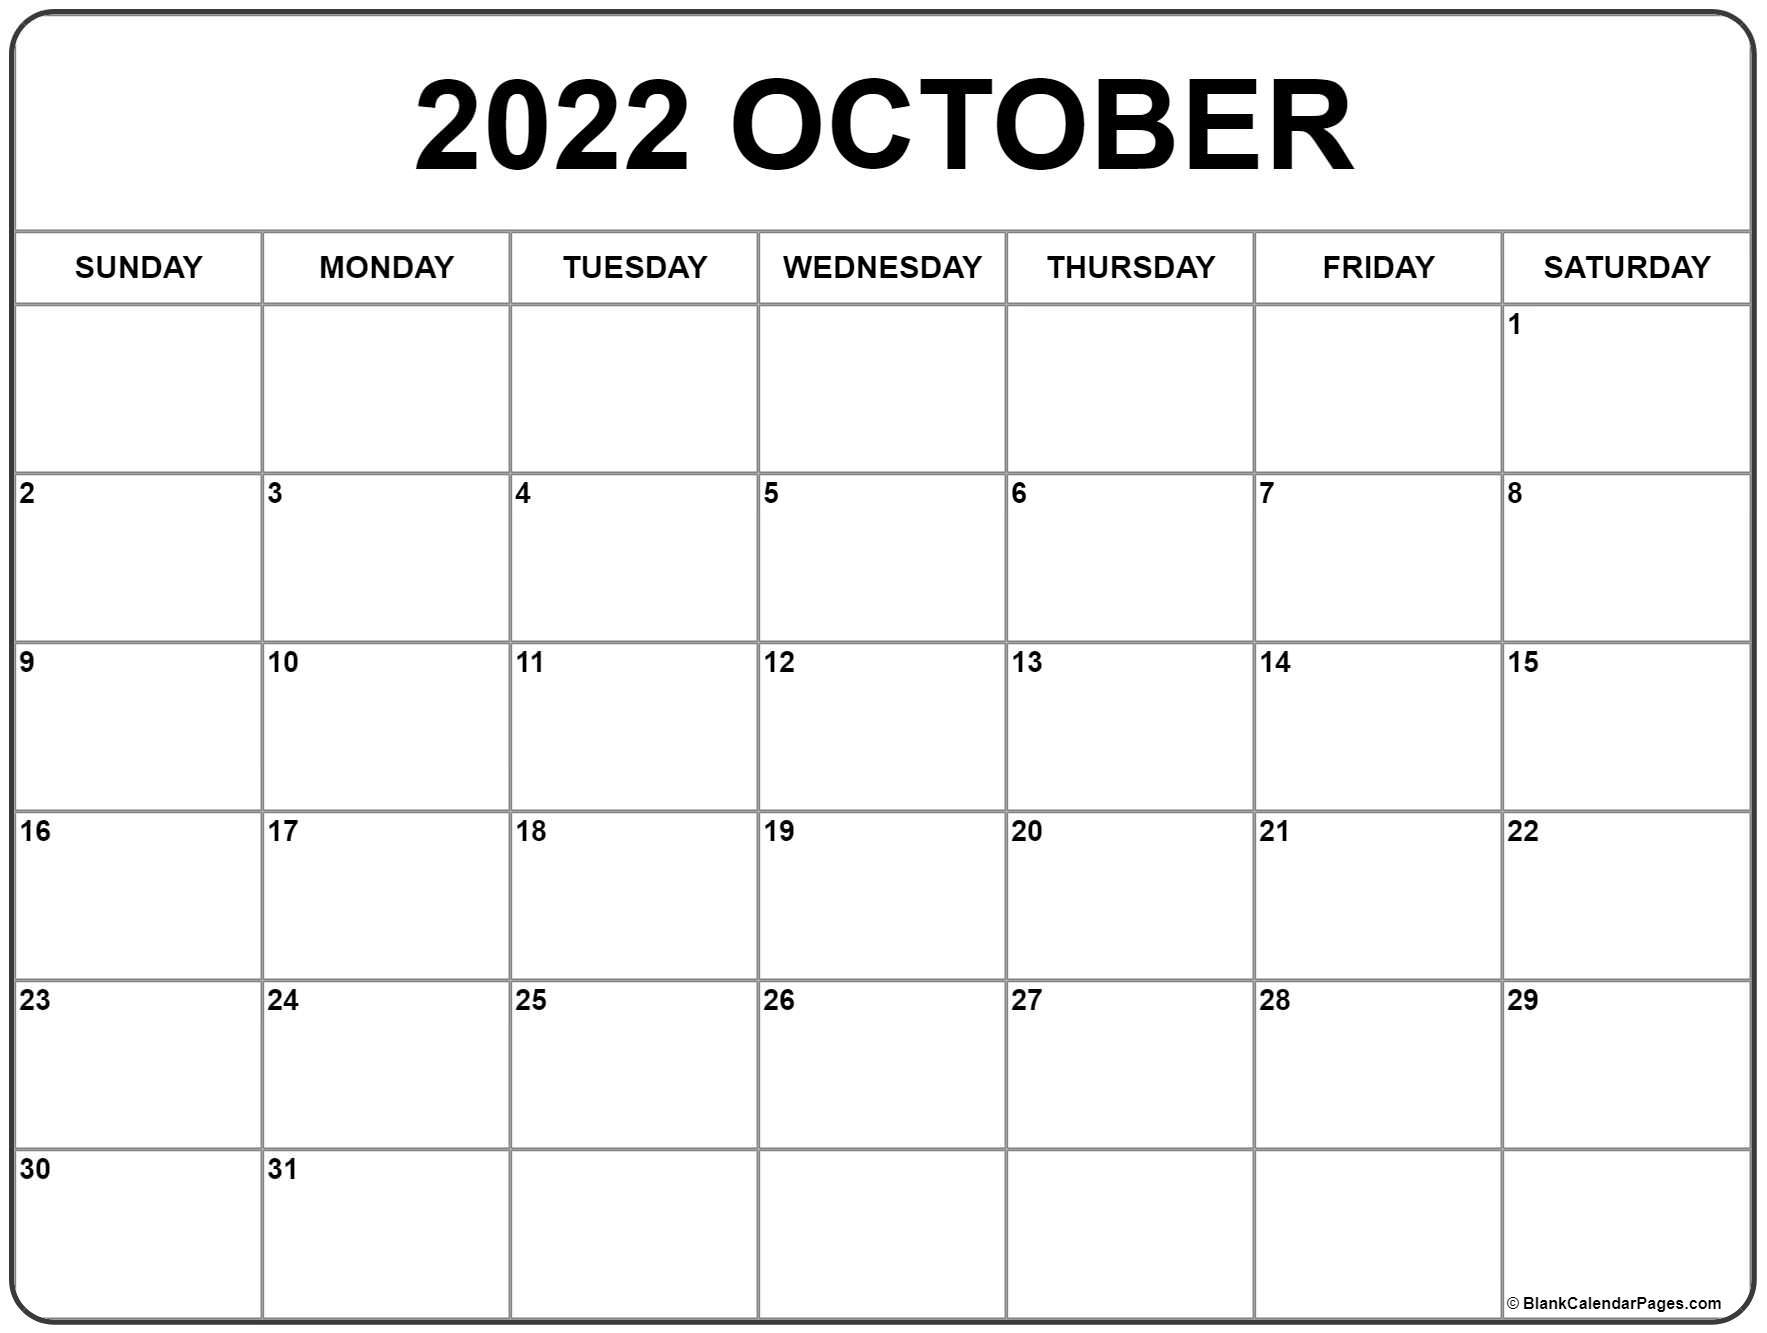 Free Printable Calendar October 2022.October 2022 Calendar Free Printable Calendar Templates